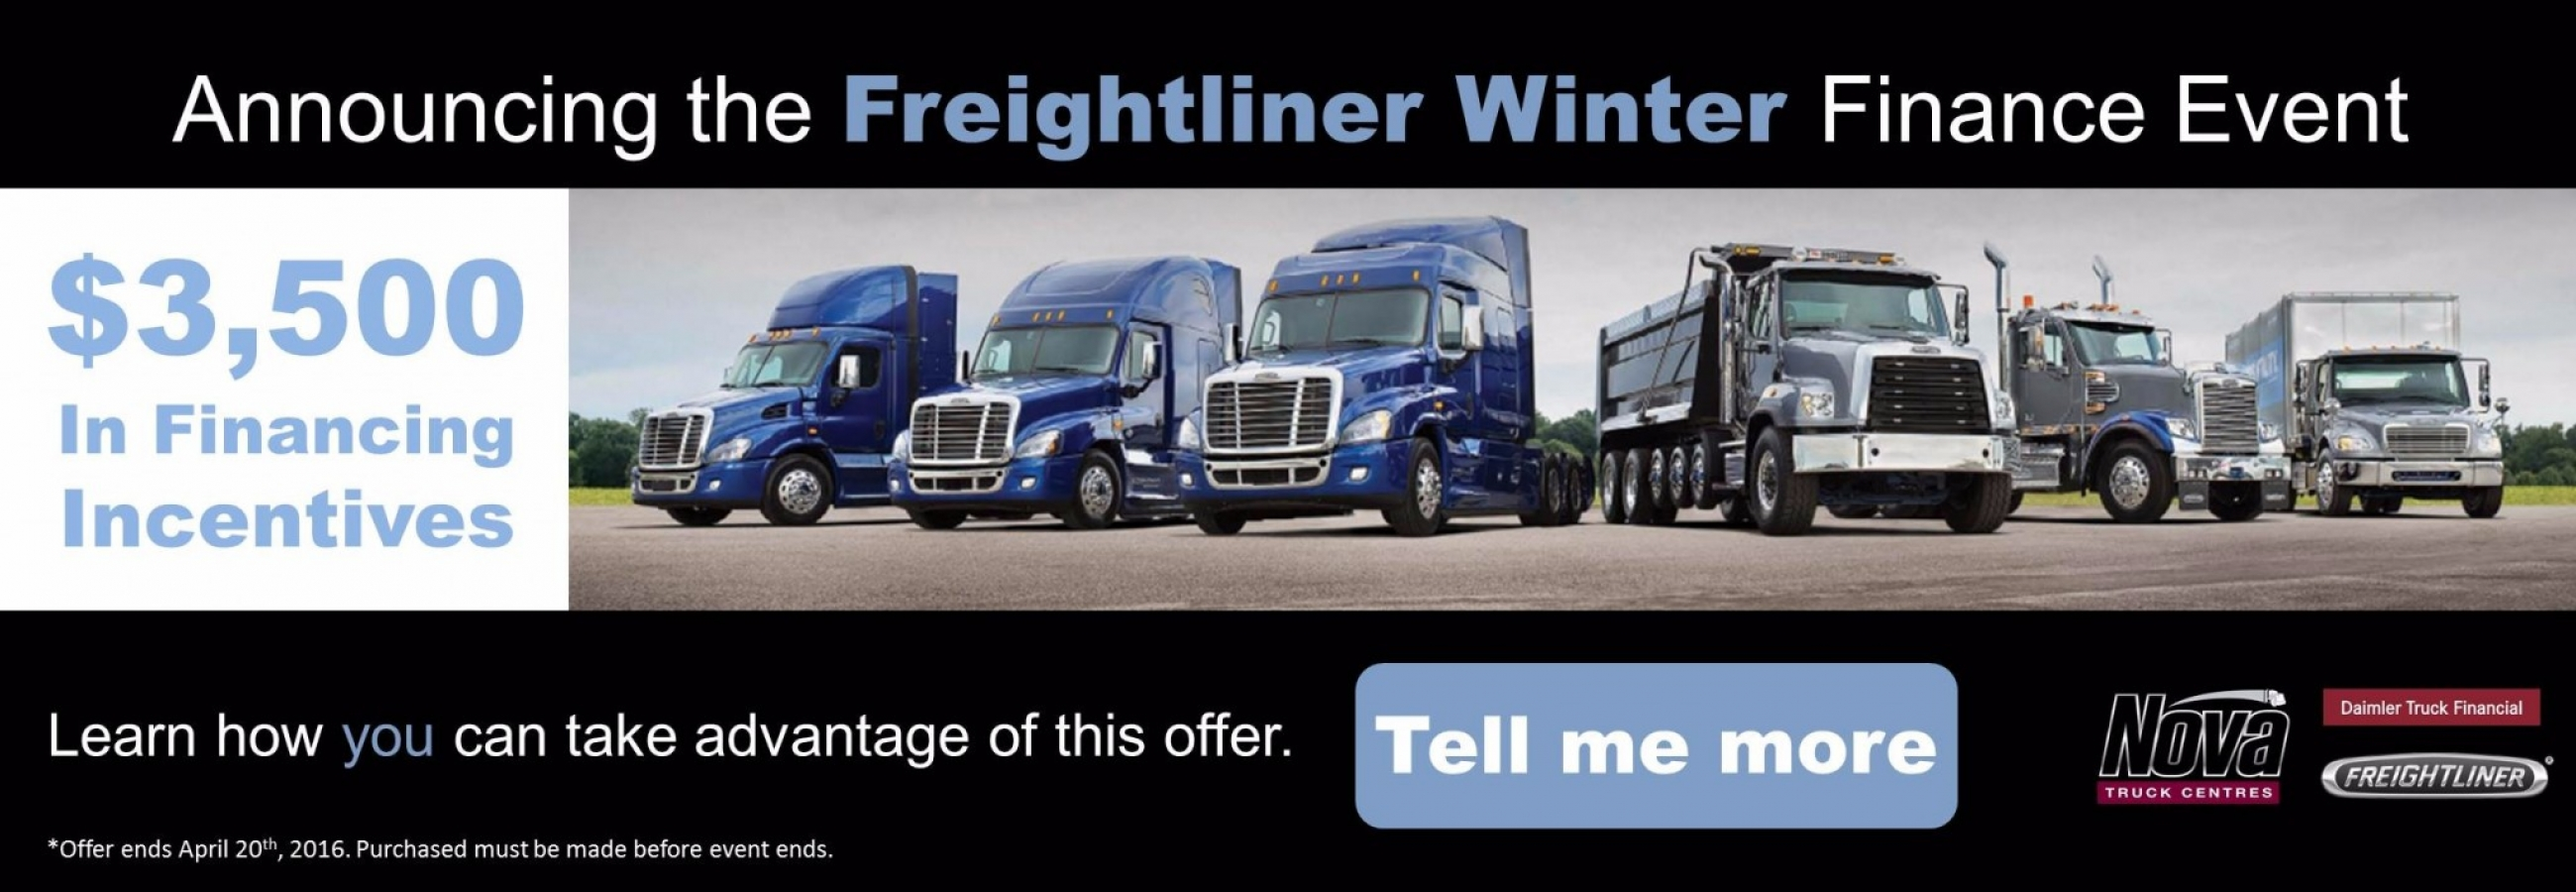 Nova Truck Centres Freightliner Winter Finance Event